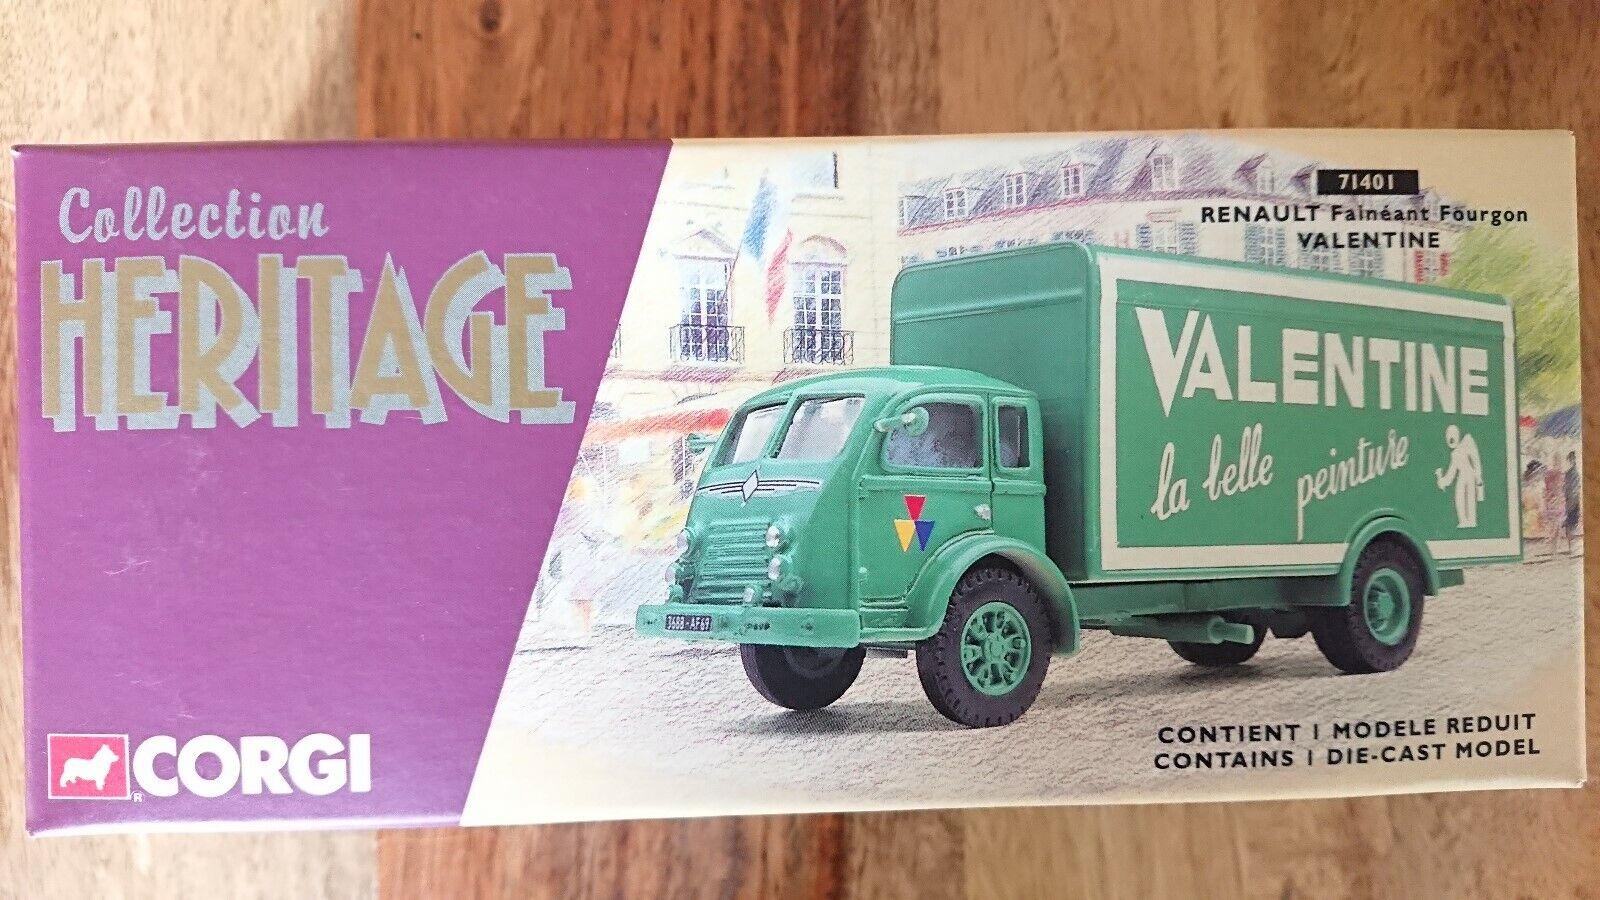 CORGI 71401 RENAULT FAINEANT baggage car Valentine Ltd Edition No 0002 de 4000